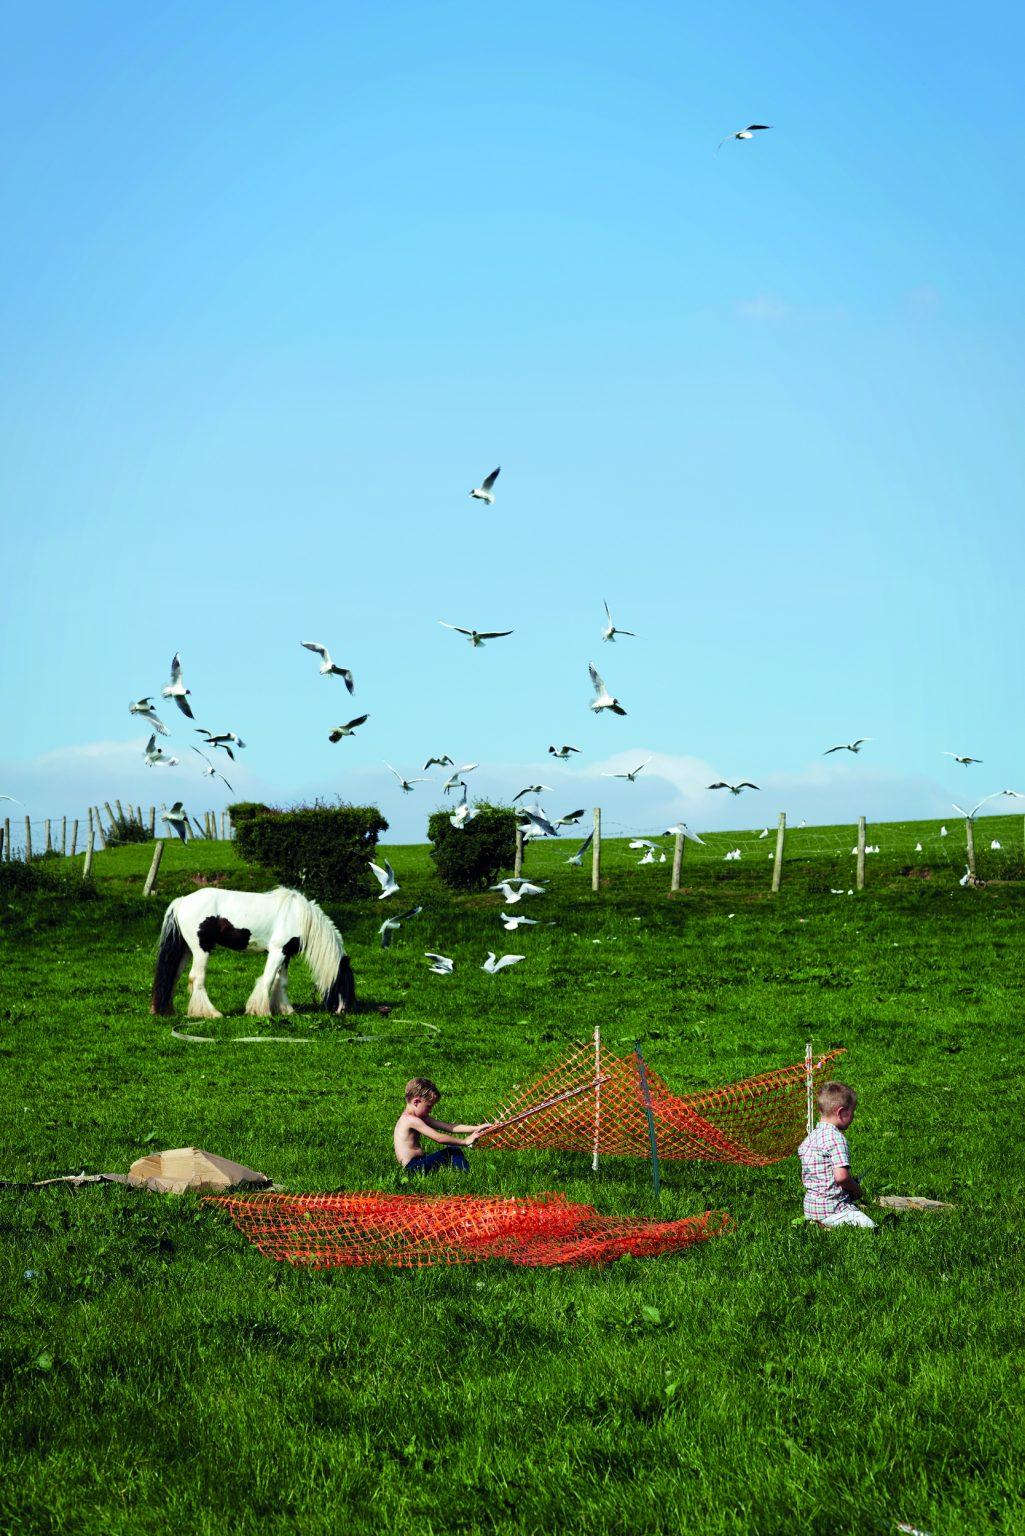 Appleby, United Kingdom, June 2016 - Appleby Horse Fair. Mason playing with his best mate in the fields behind the market parking lot. ><  Appleby, Regno Unito, giugno 2016 - Appleby Horse Fair. Mason gioca col suo migliore amico nei campi retrostanti il parcheggio del negozio. *** Local Caption ***